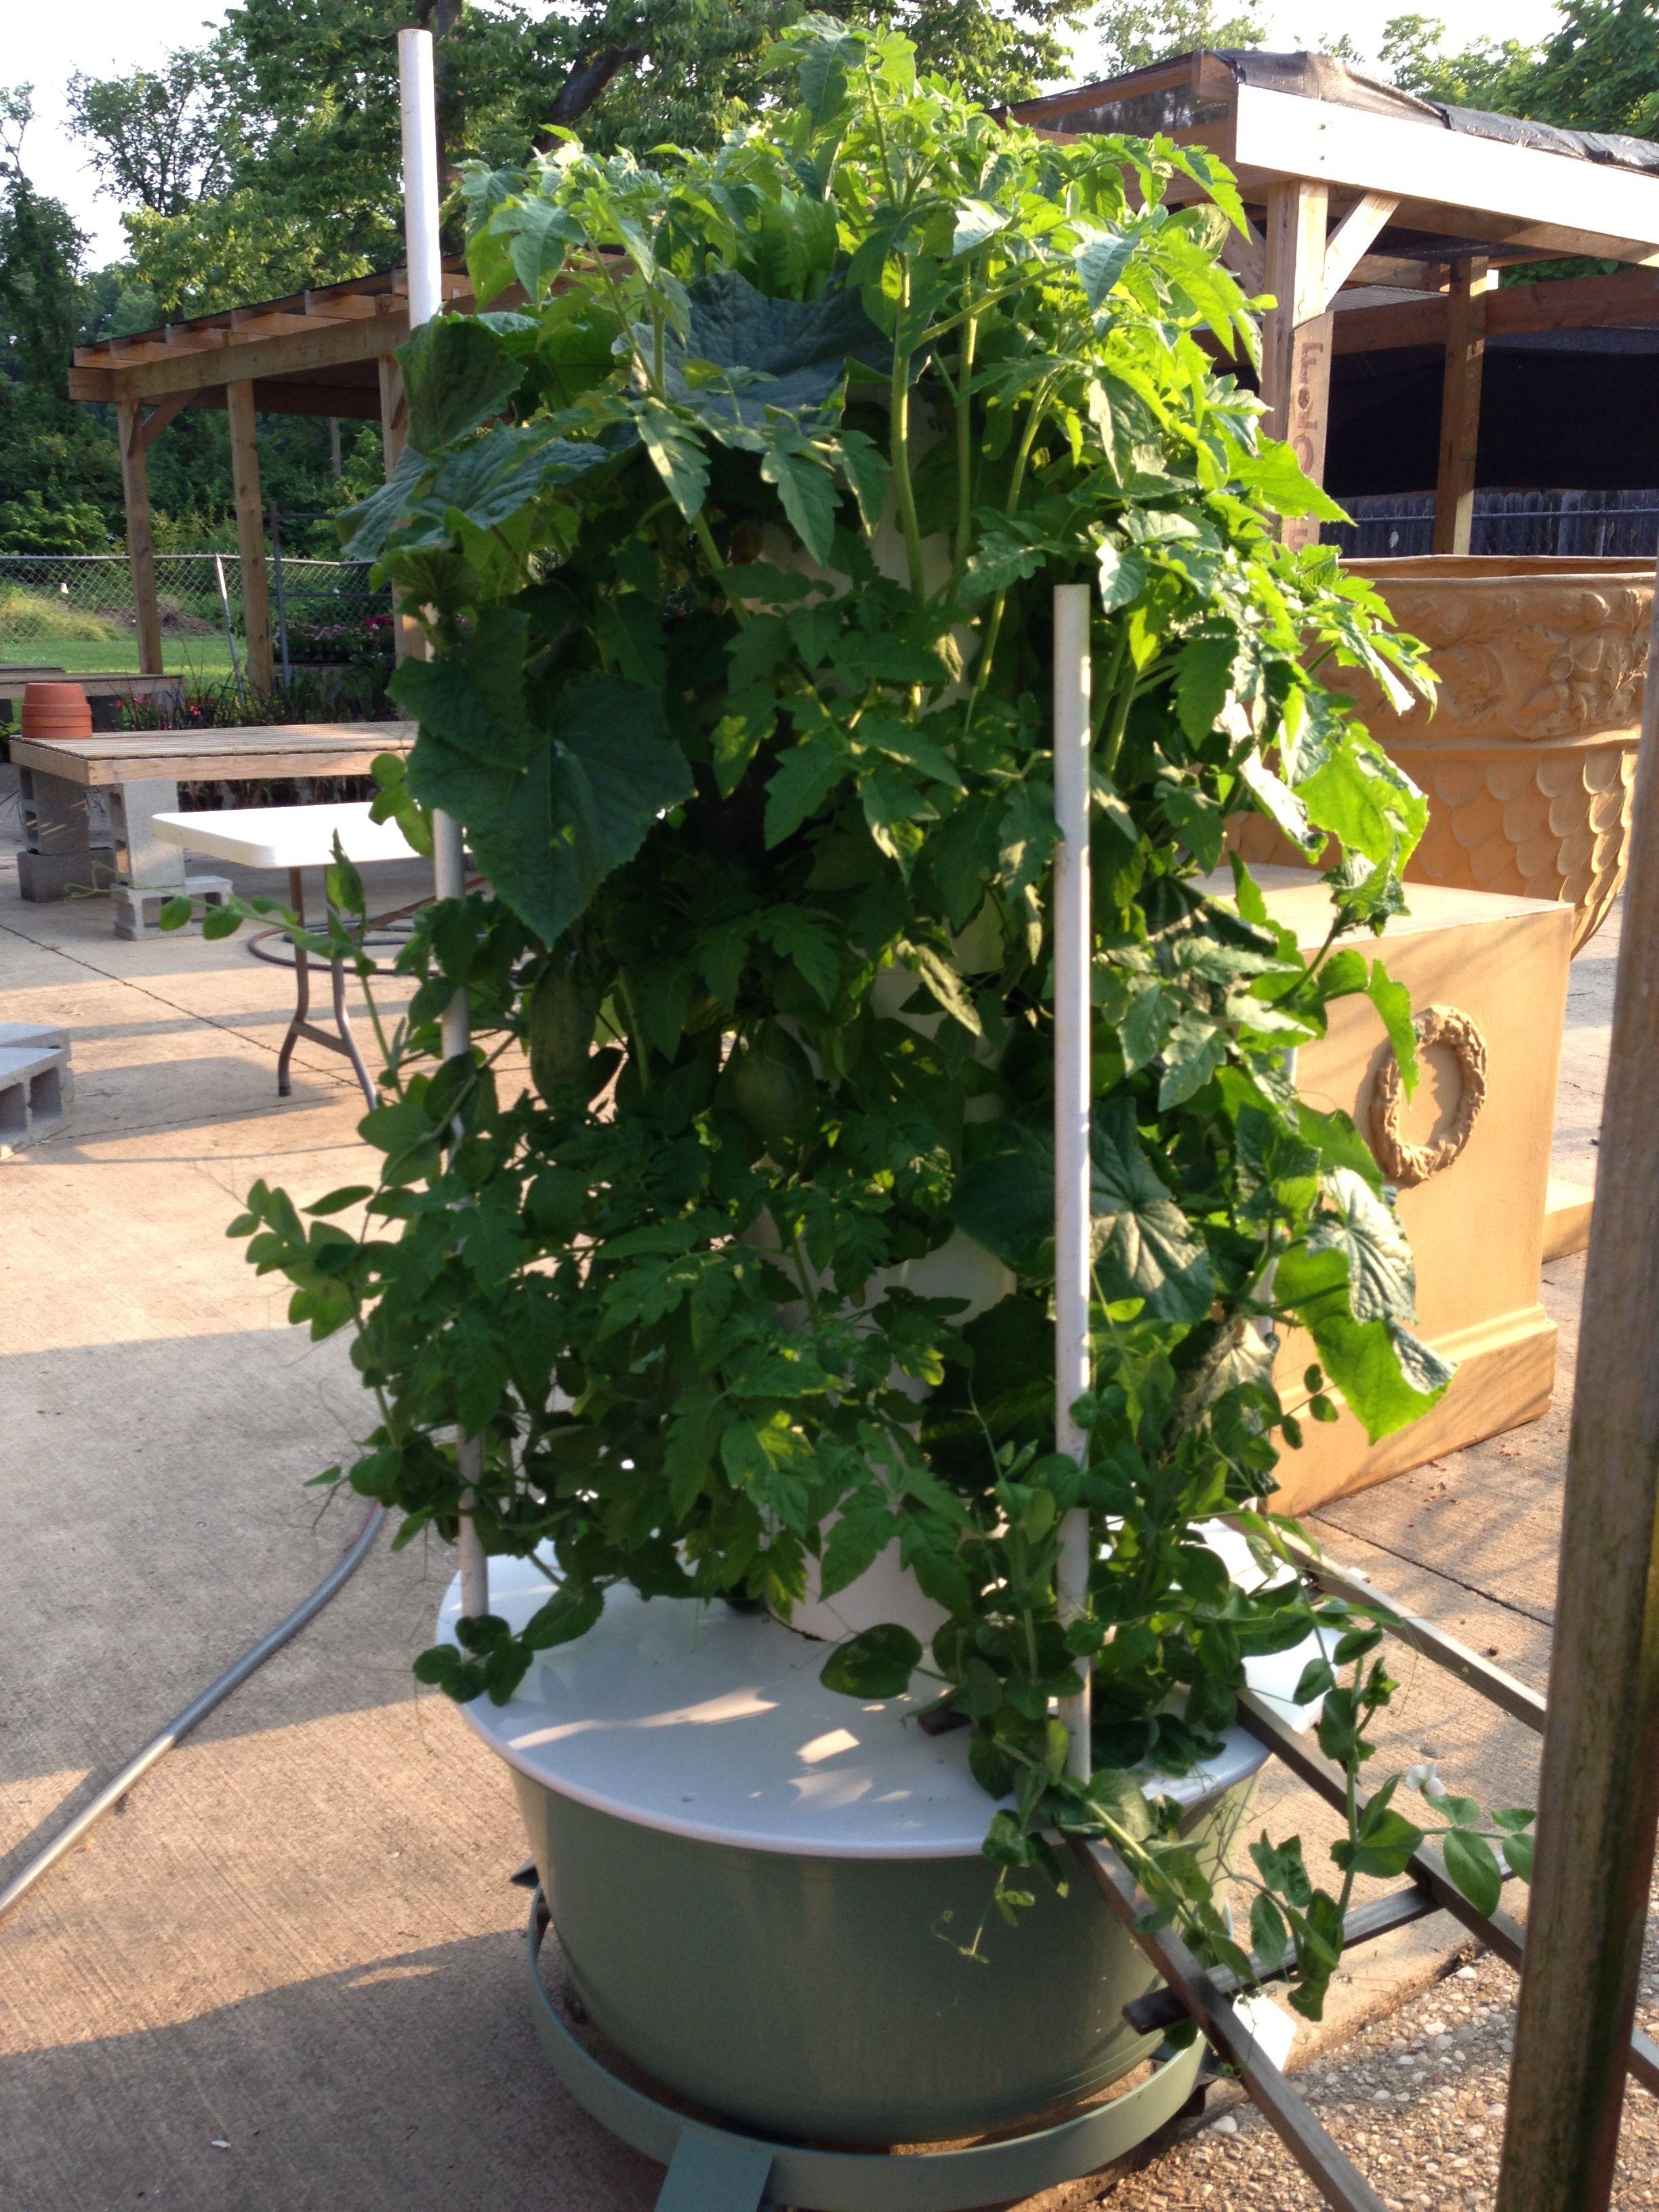 Hydroponic Tower garden VERTICAL GARDENS Vertical